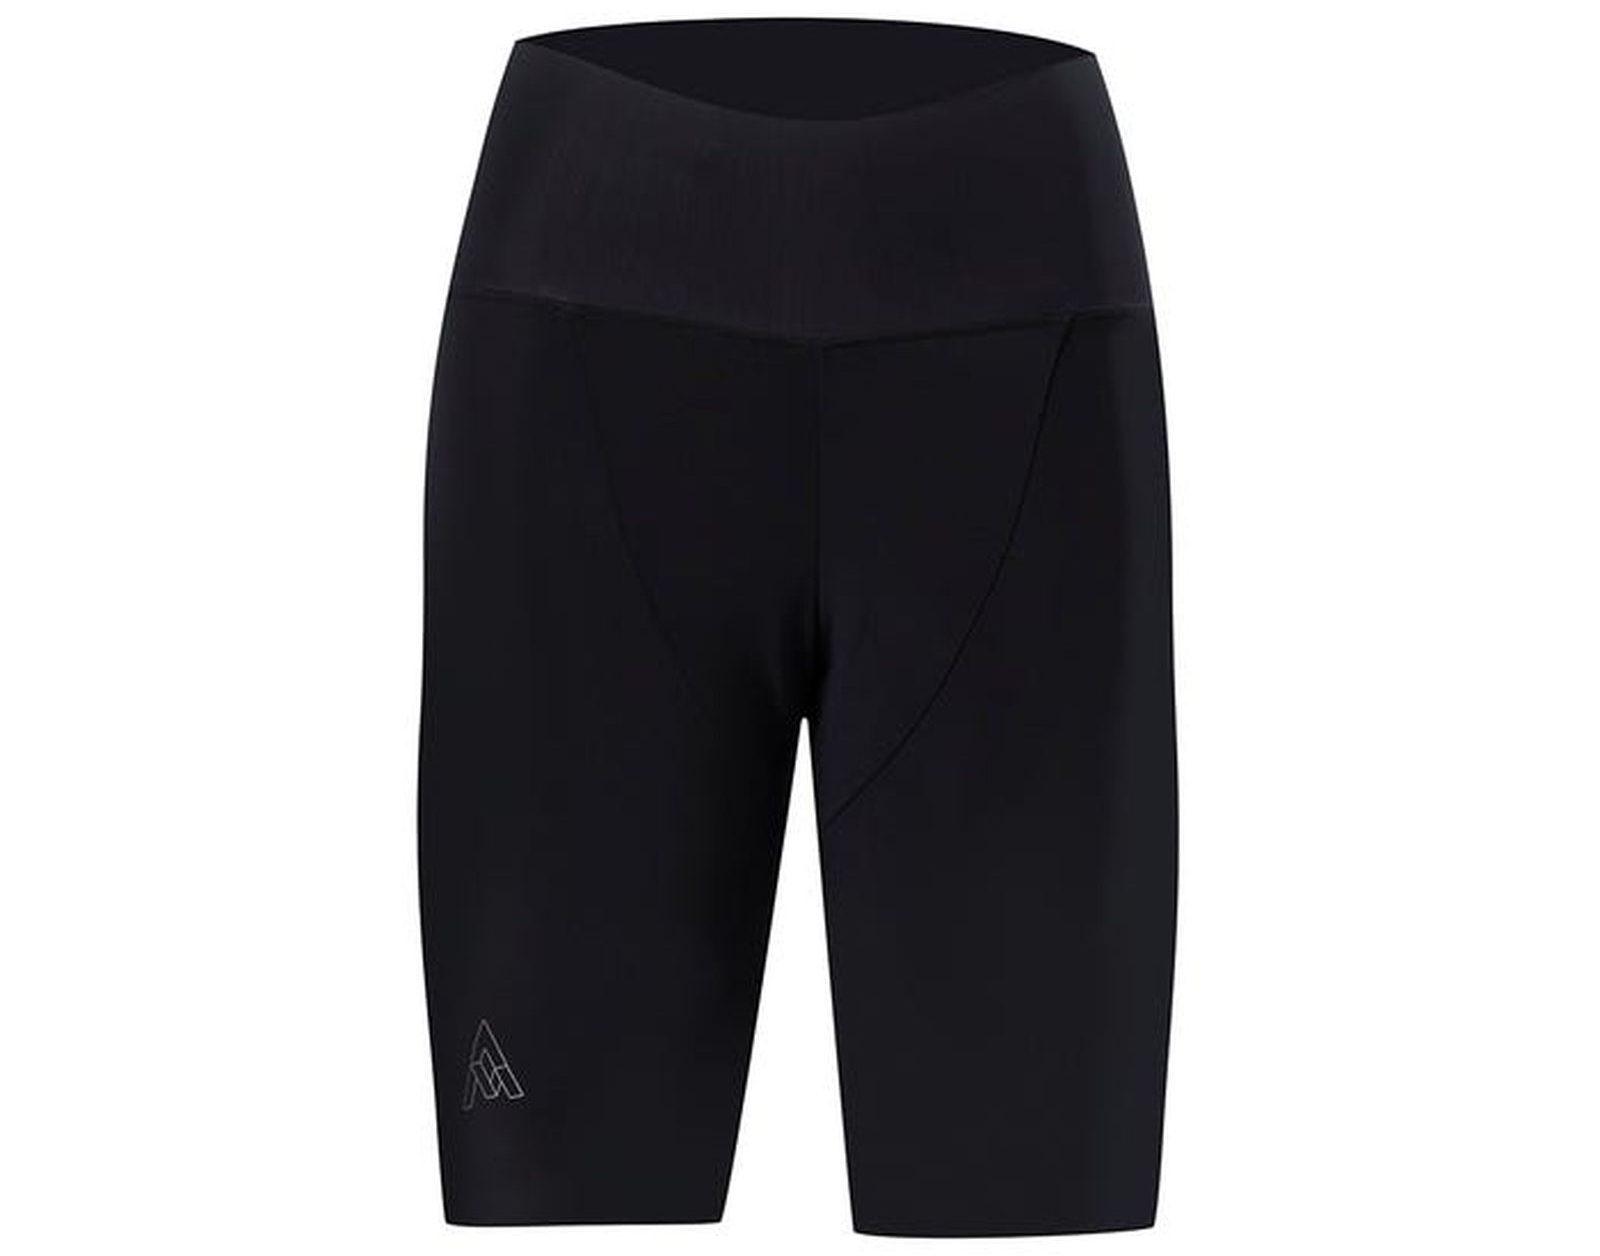 7mesh-wk2-short best womens cycling shorts